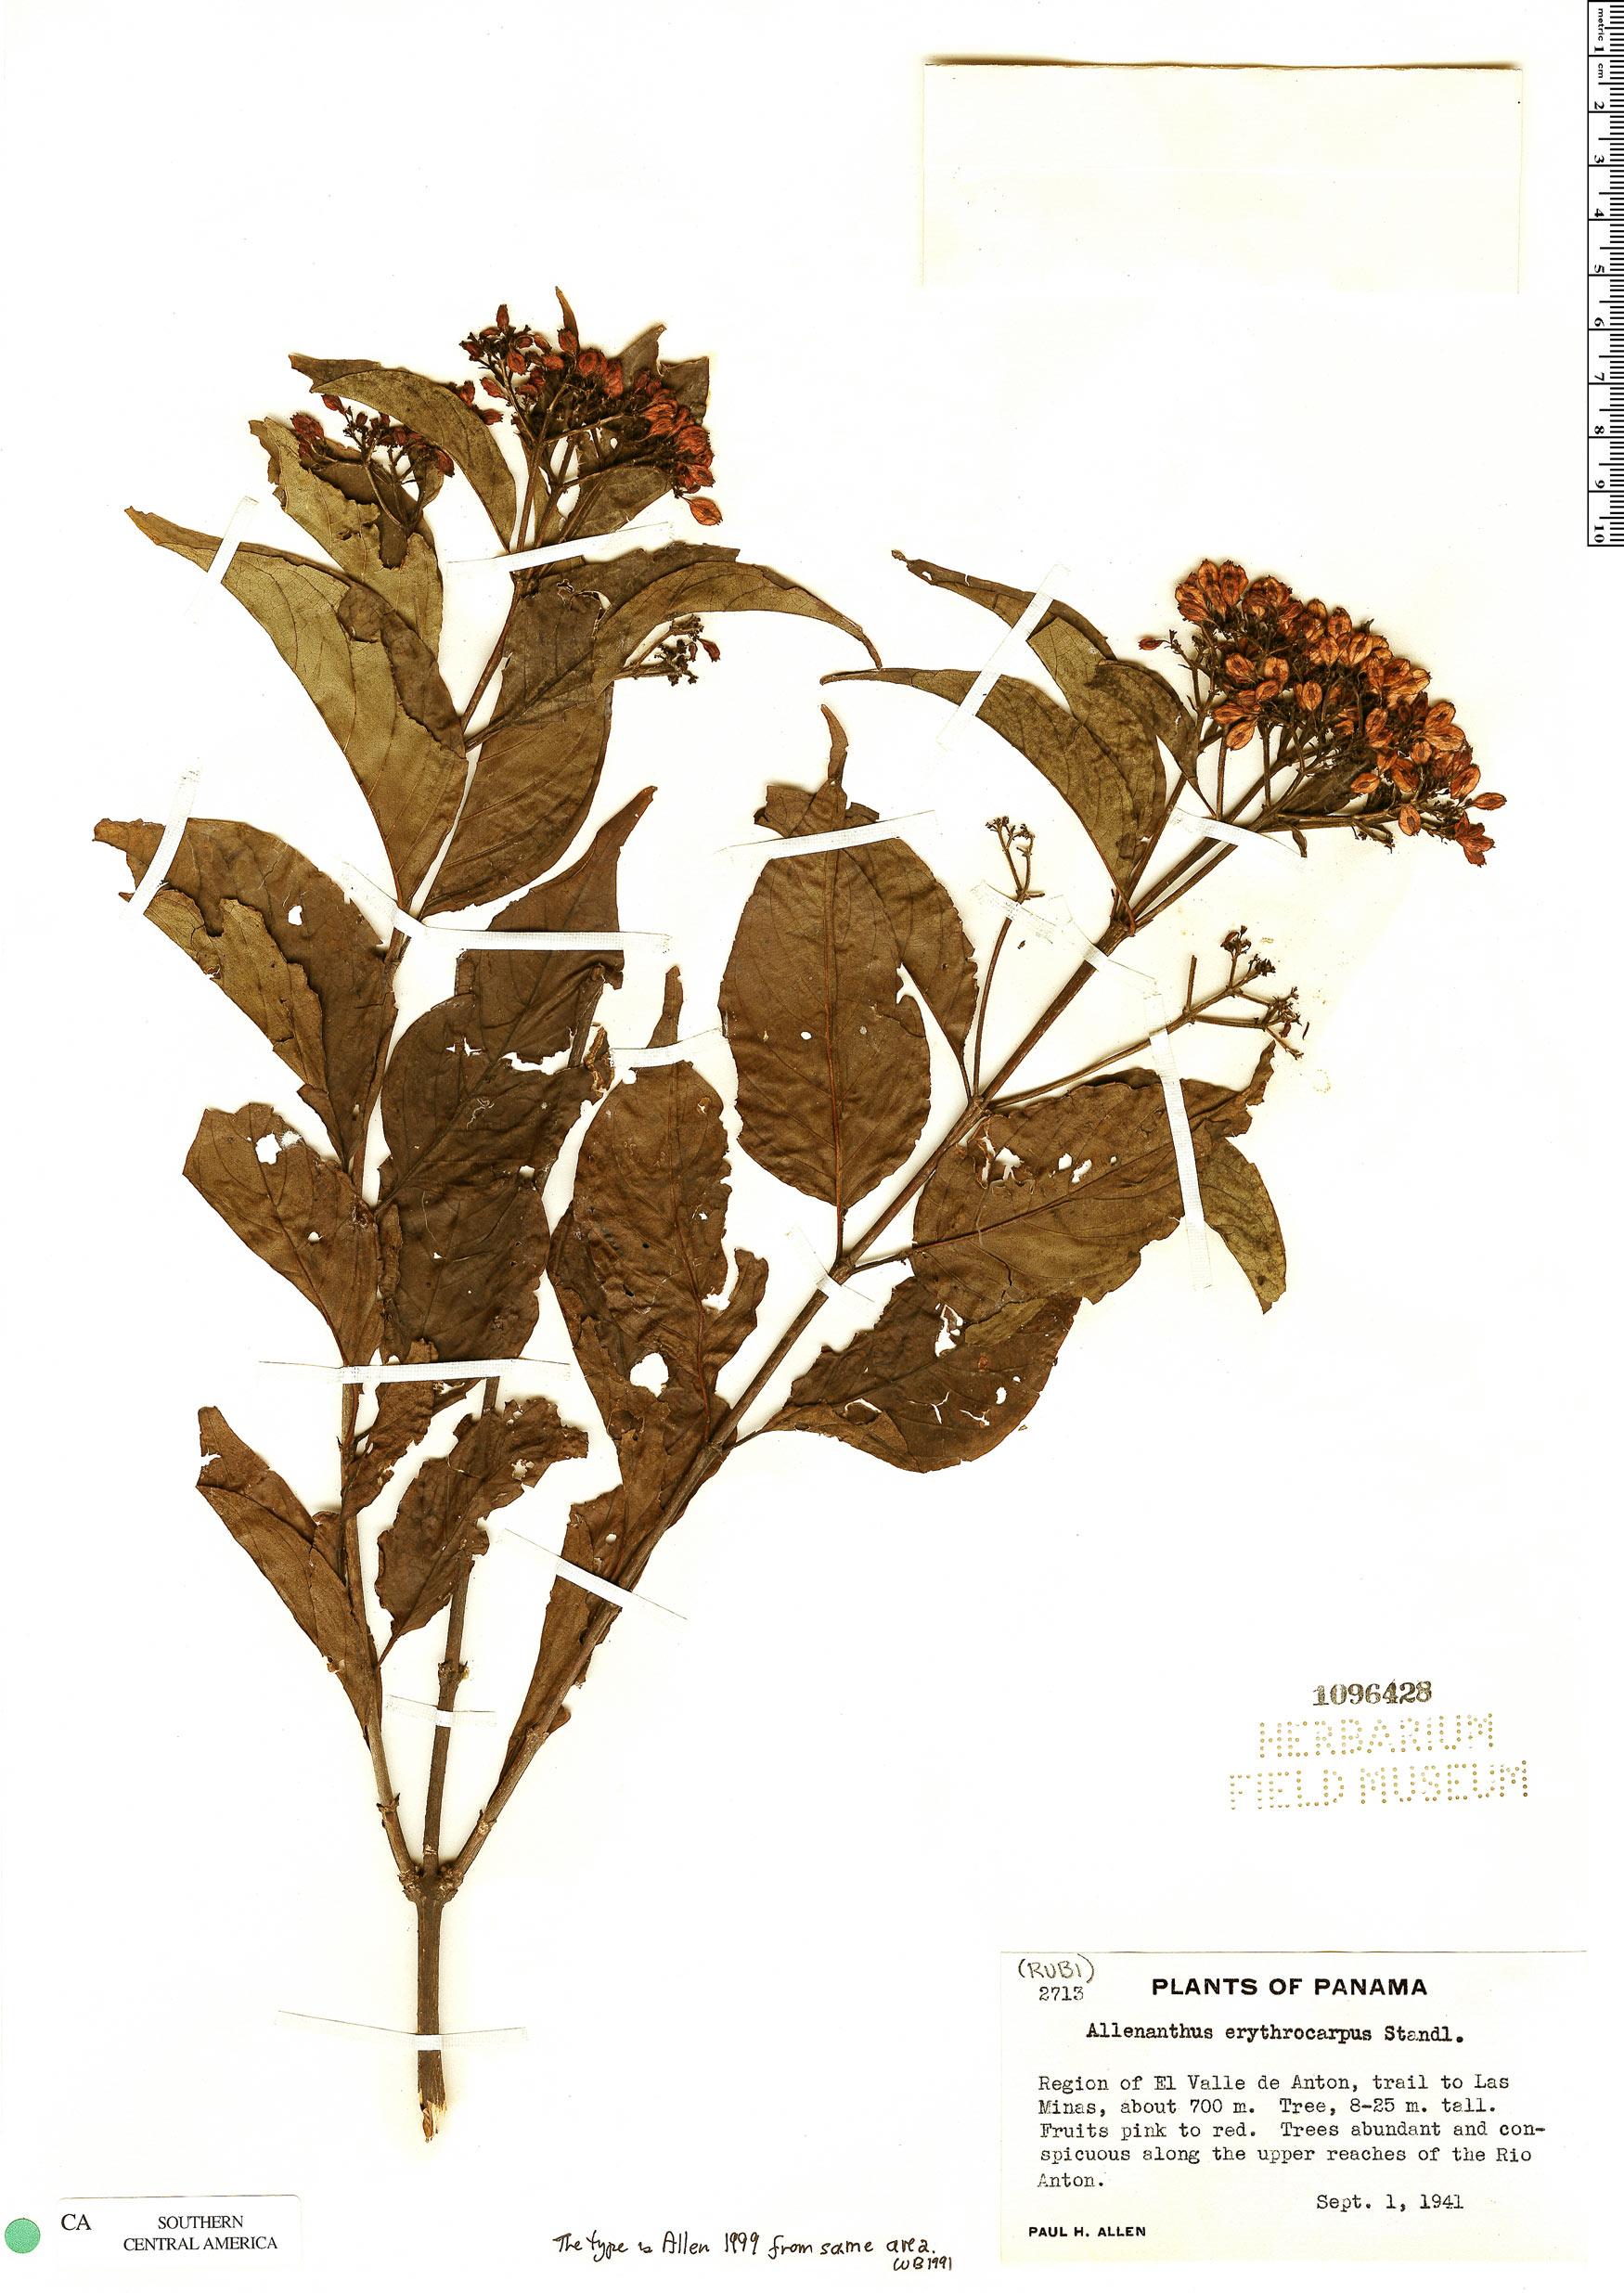 Specimen: Allenanthus erythrocarpus